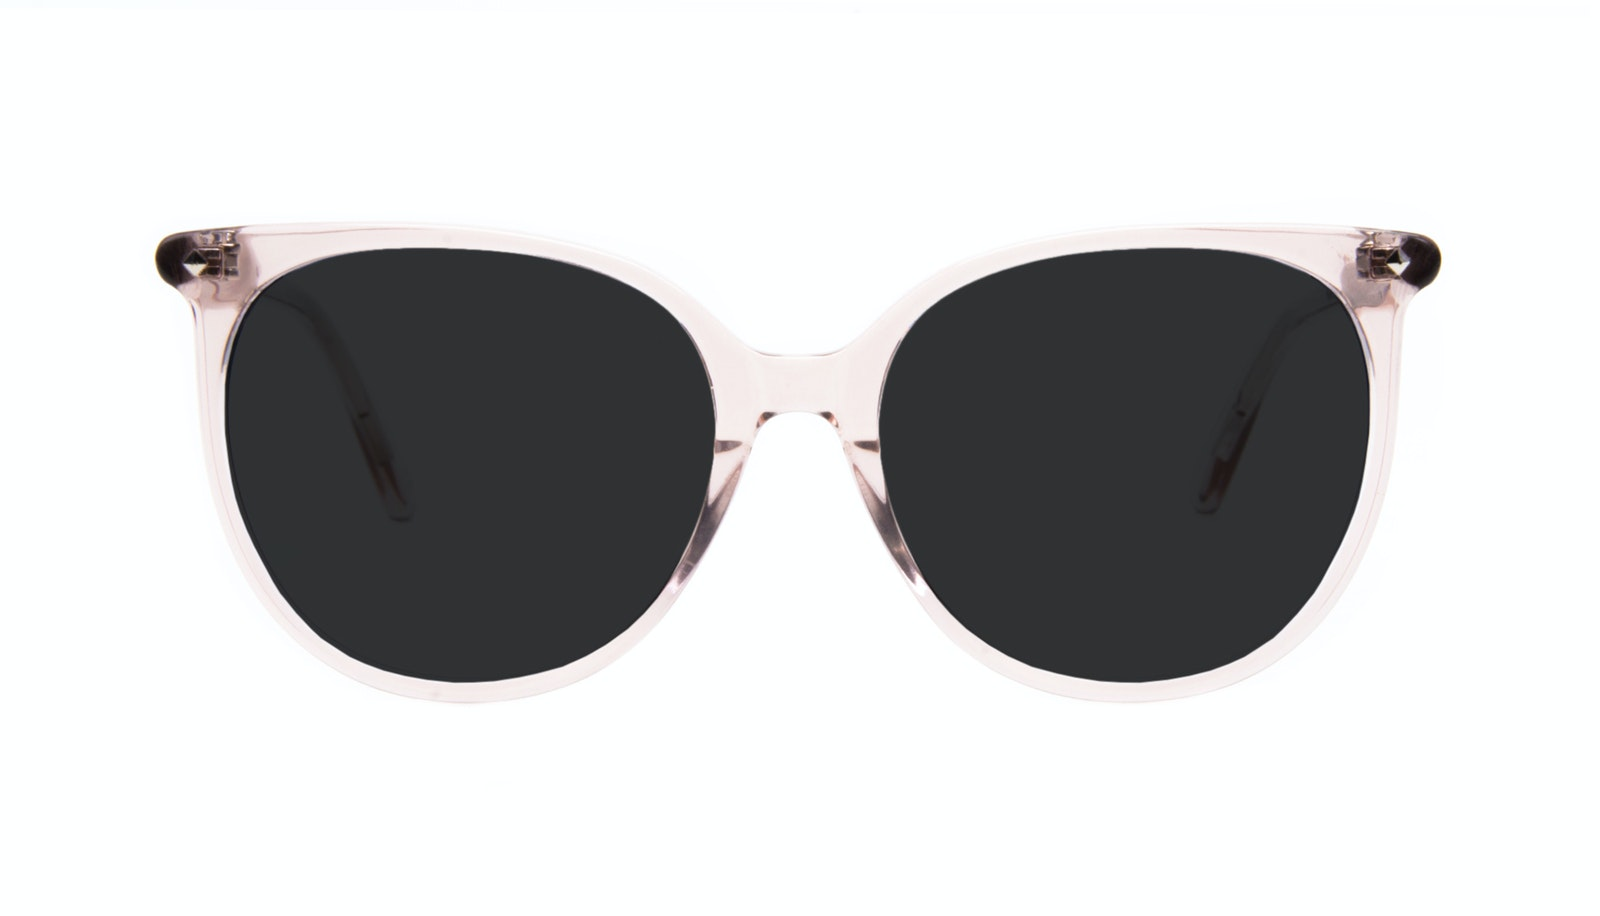 Affordable Fashion Glasses Round Sunglasses Women Area Rose